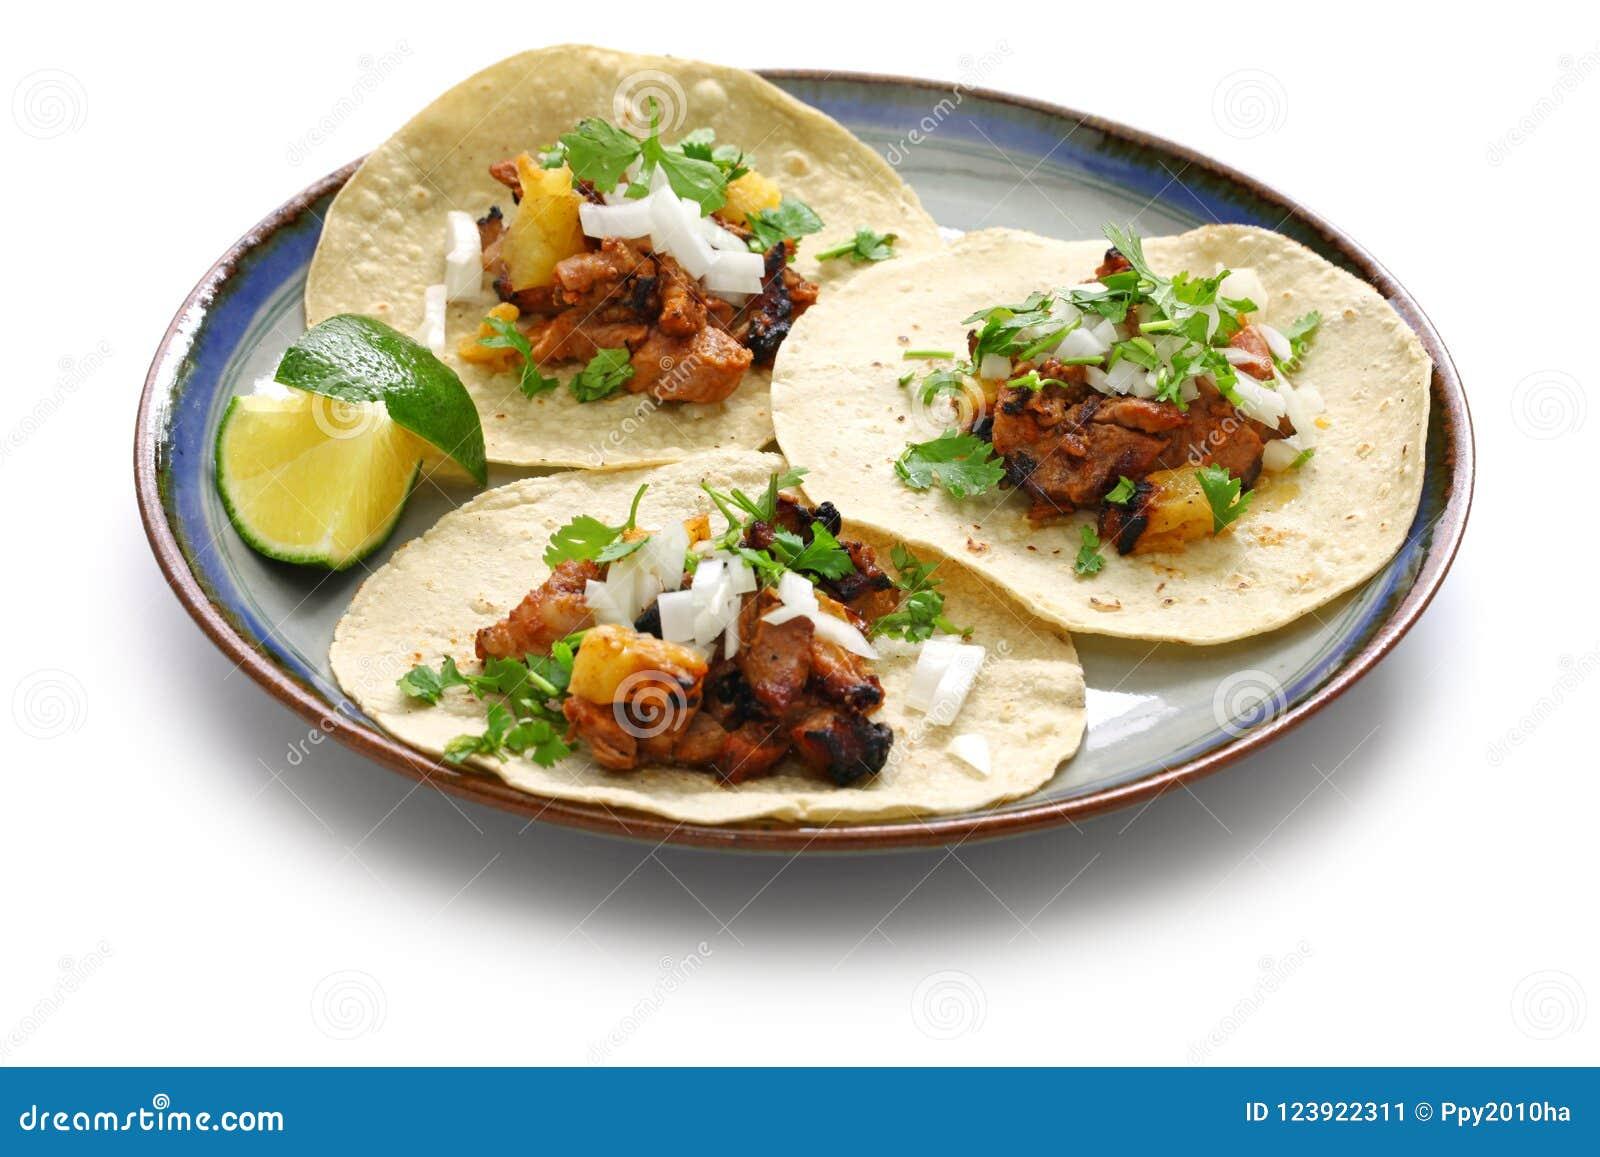 Pastor do al dos tacos, alimento mexicano